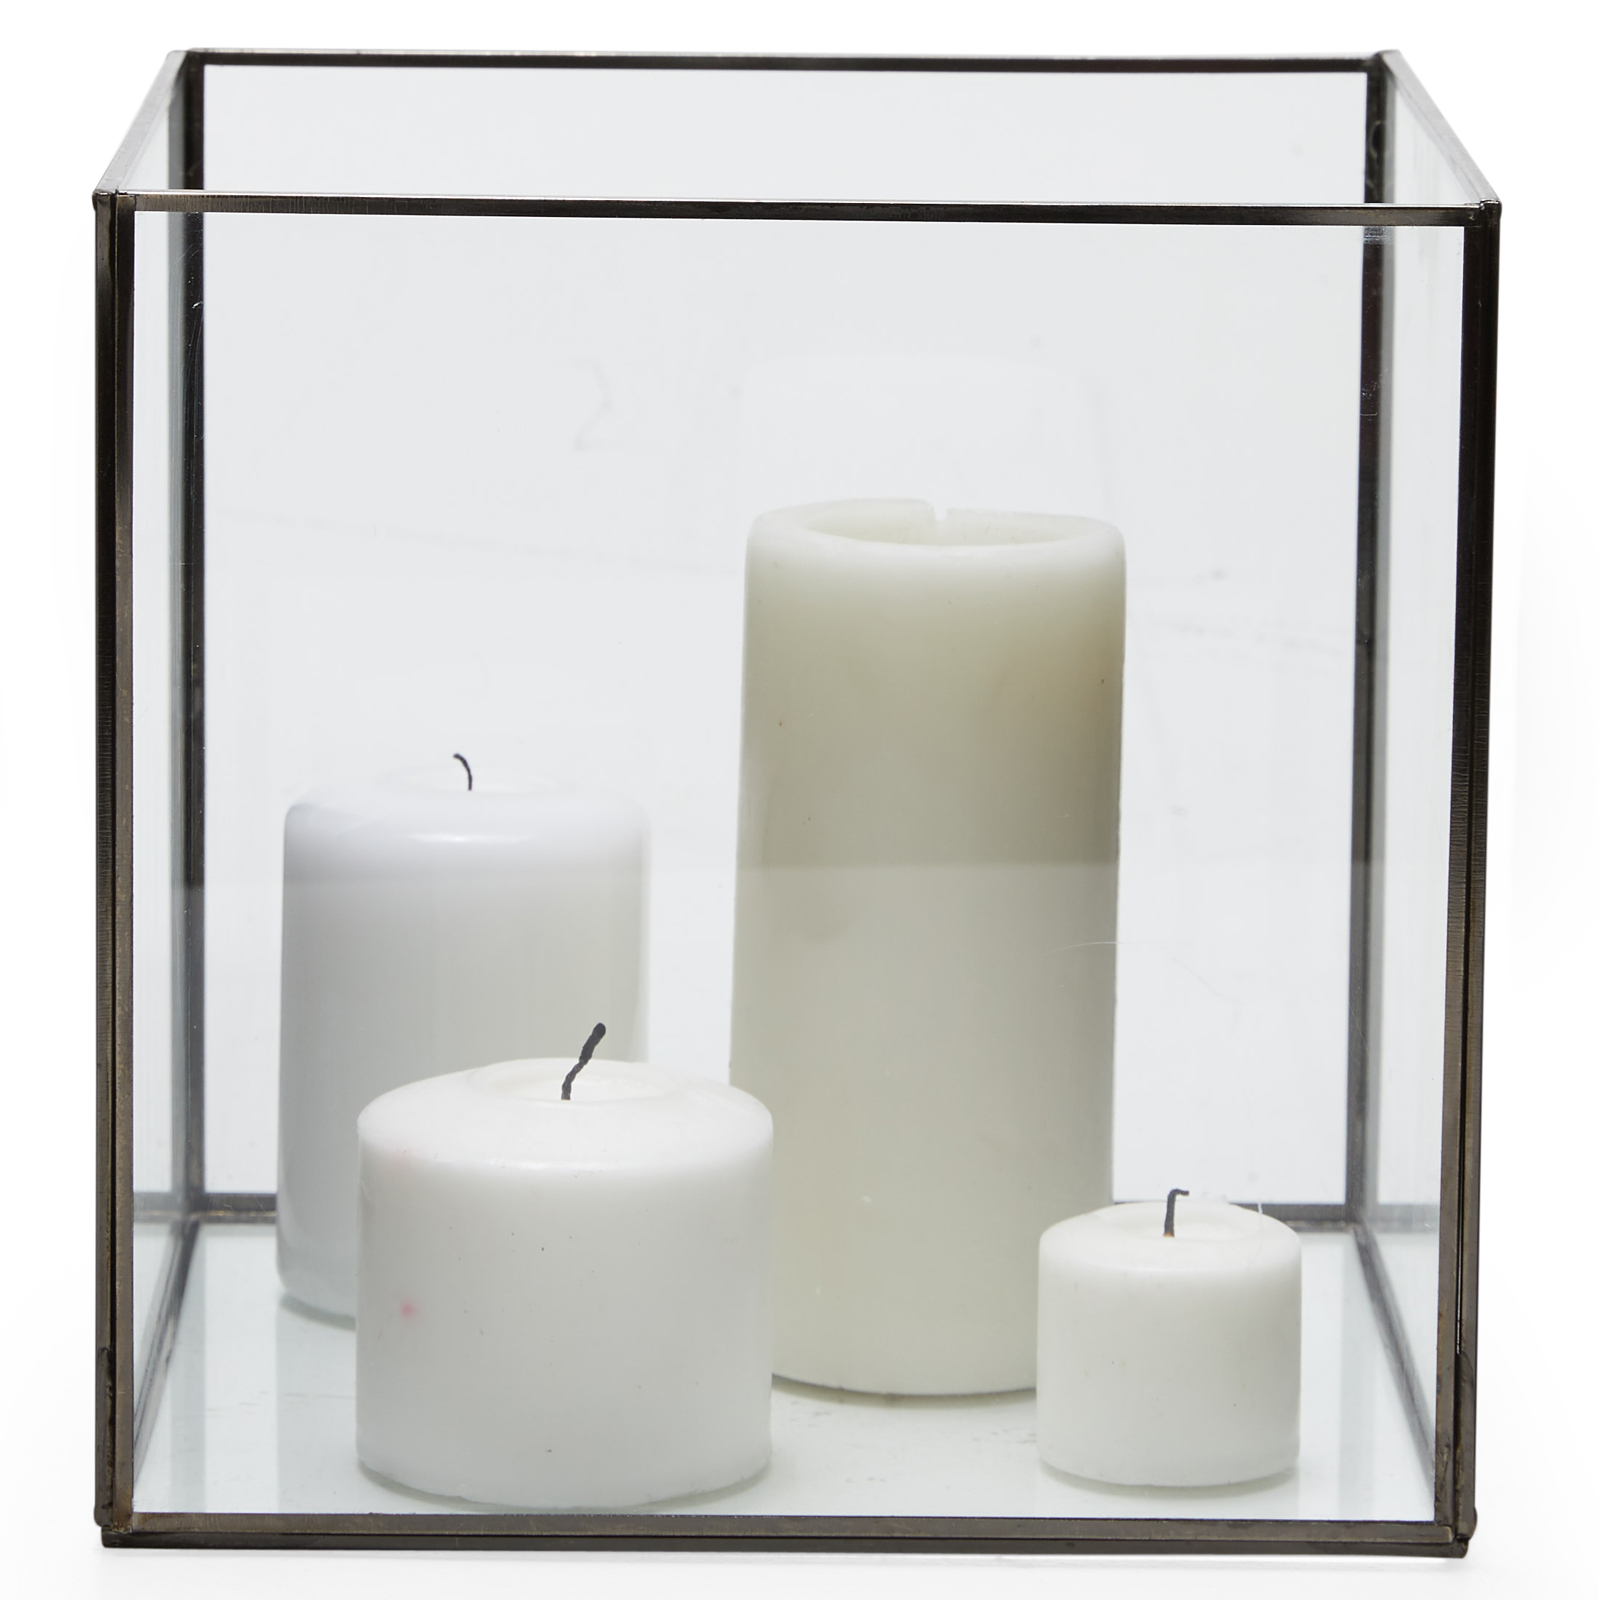 Modrn Matte Black Glass Candle Holder Walmart Com Walmart Com